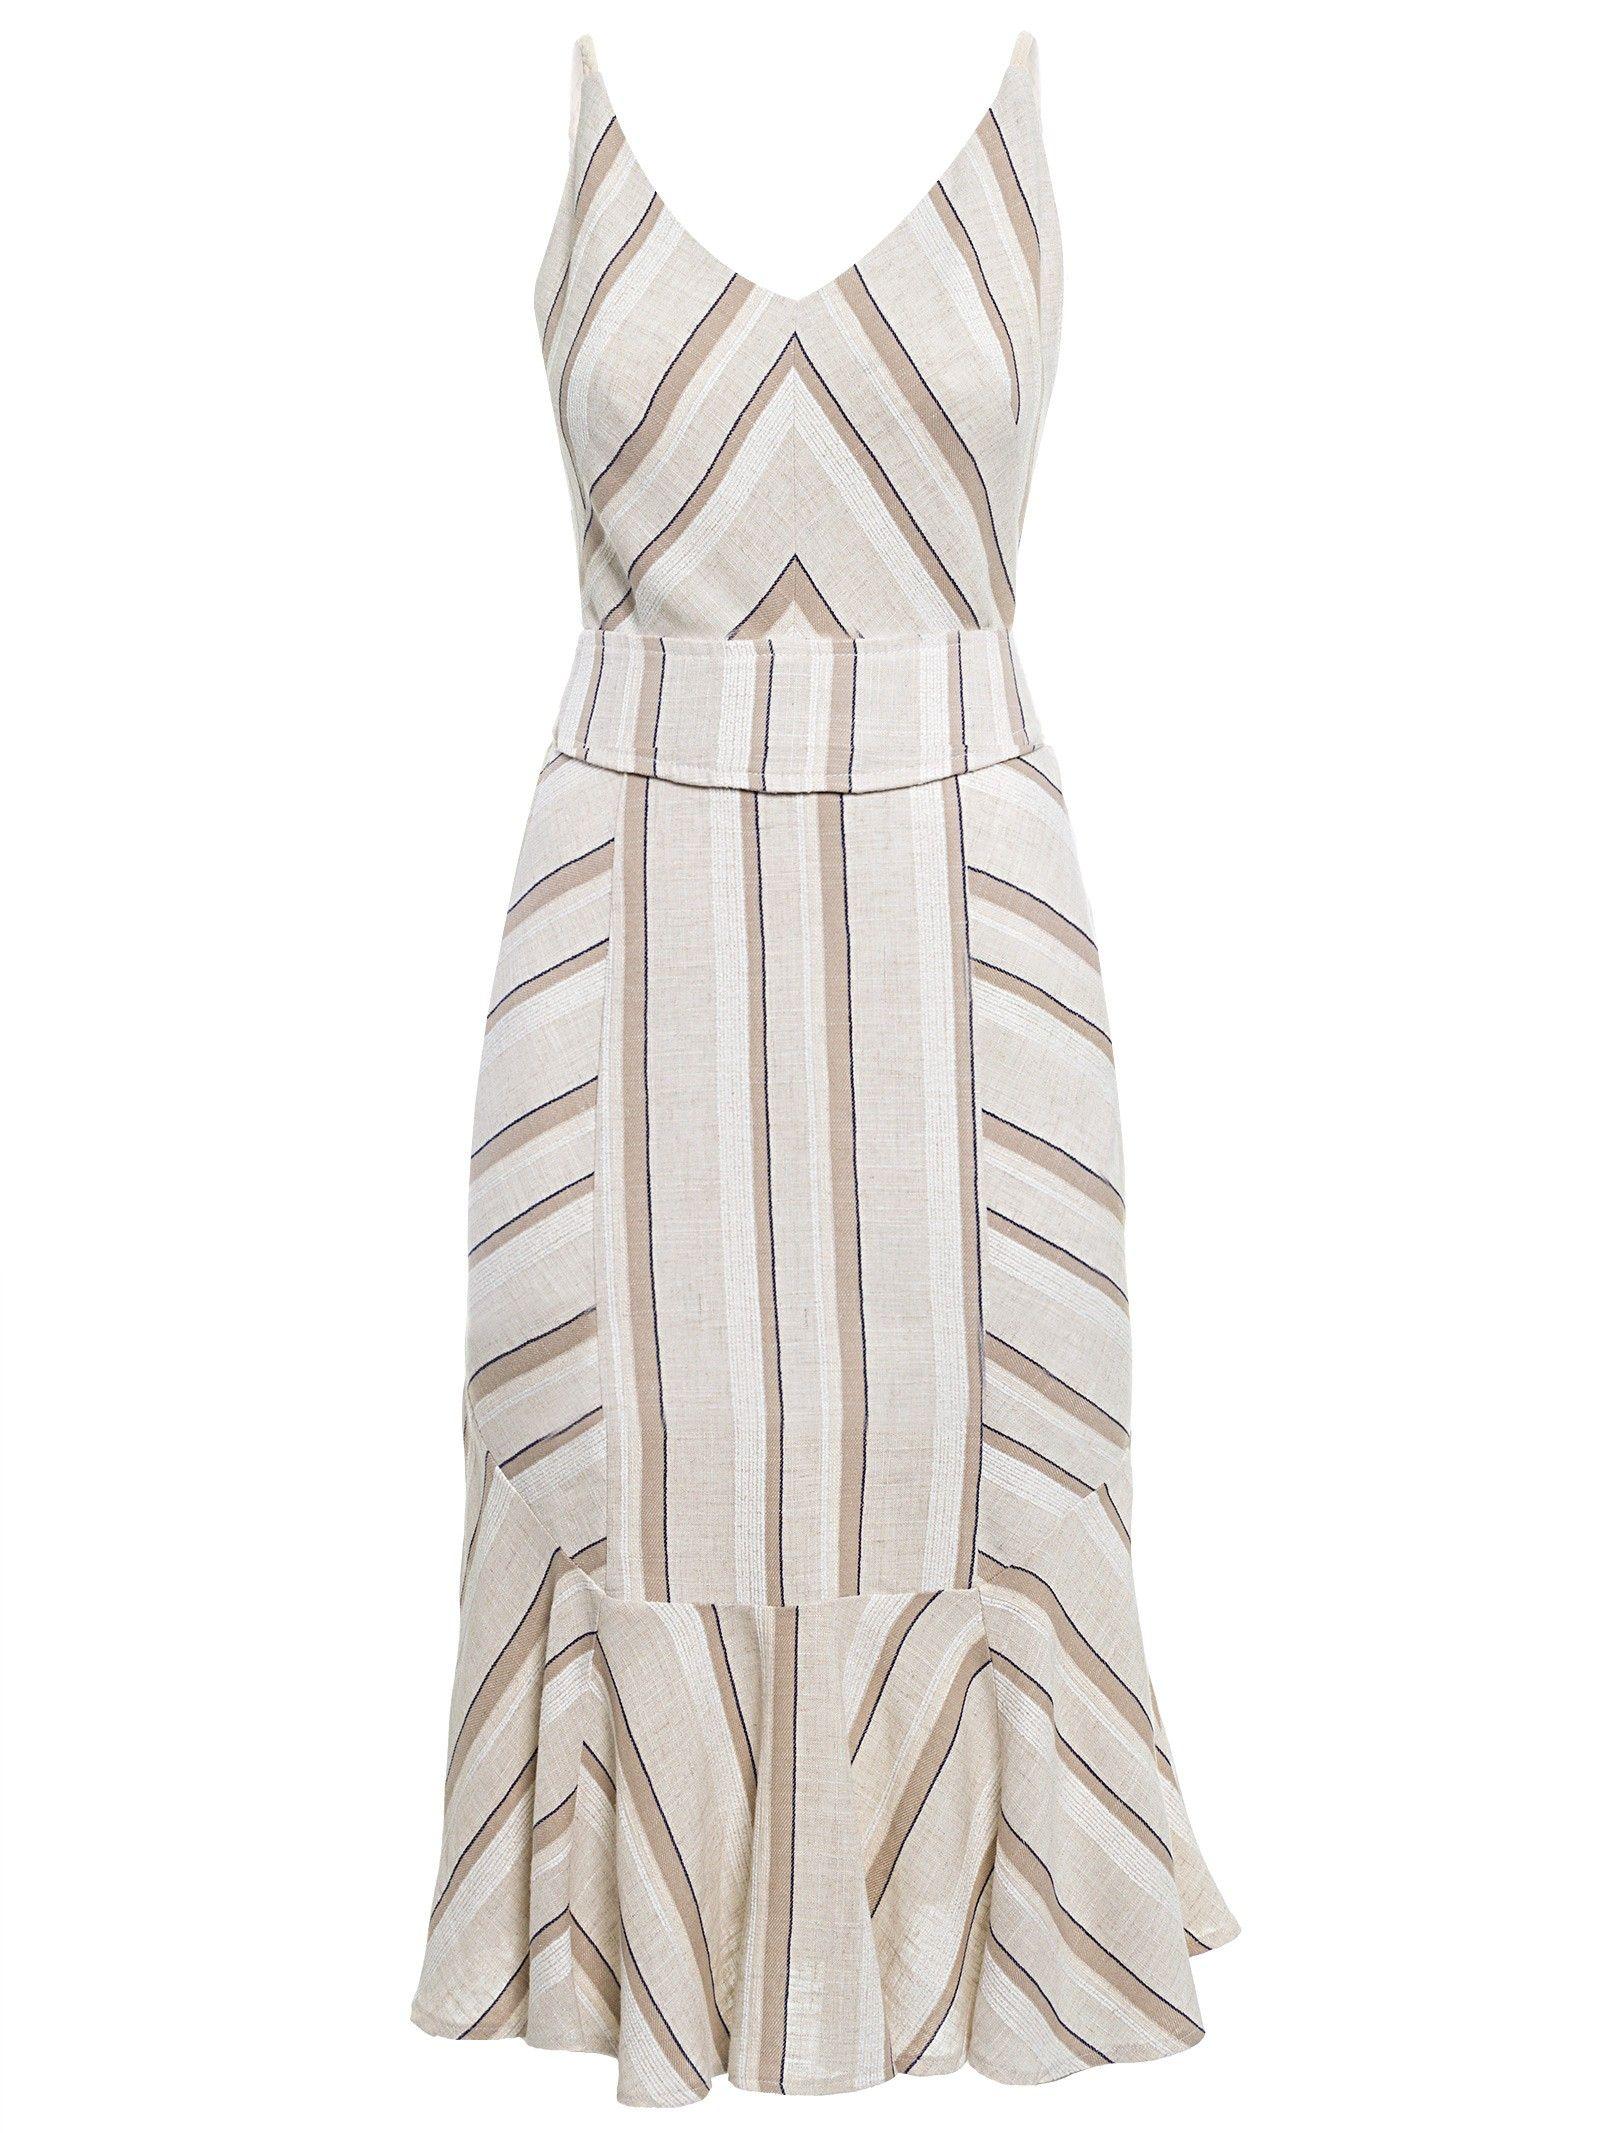 Vestido Carla - Le Lis Blanc - Off White - Shop2gether | vestidos ...